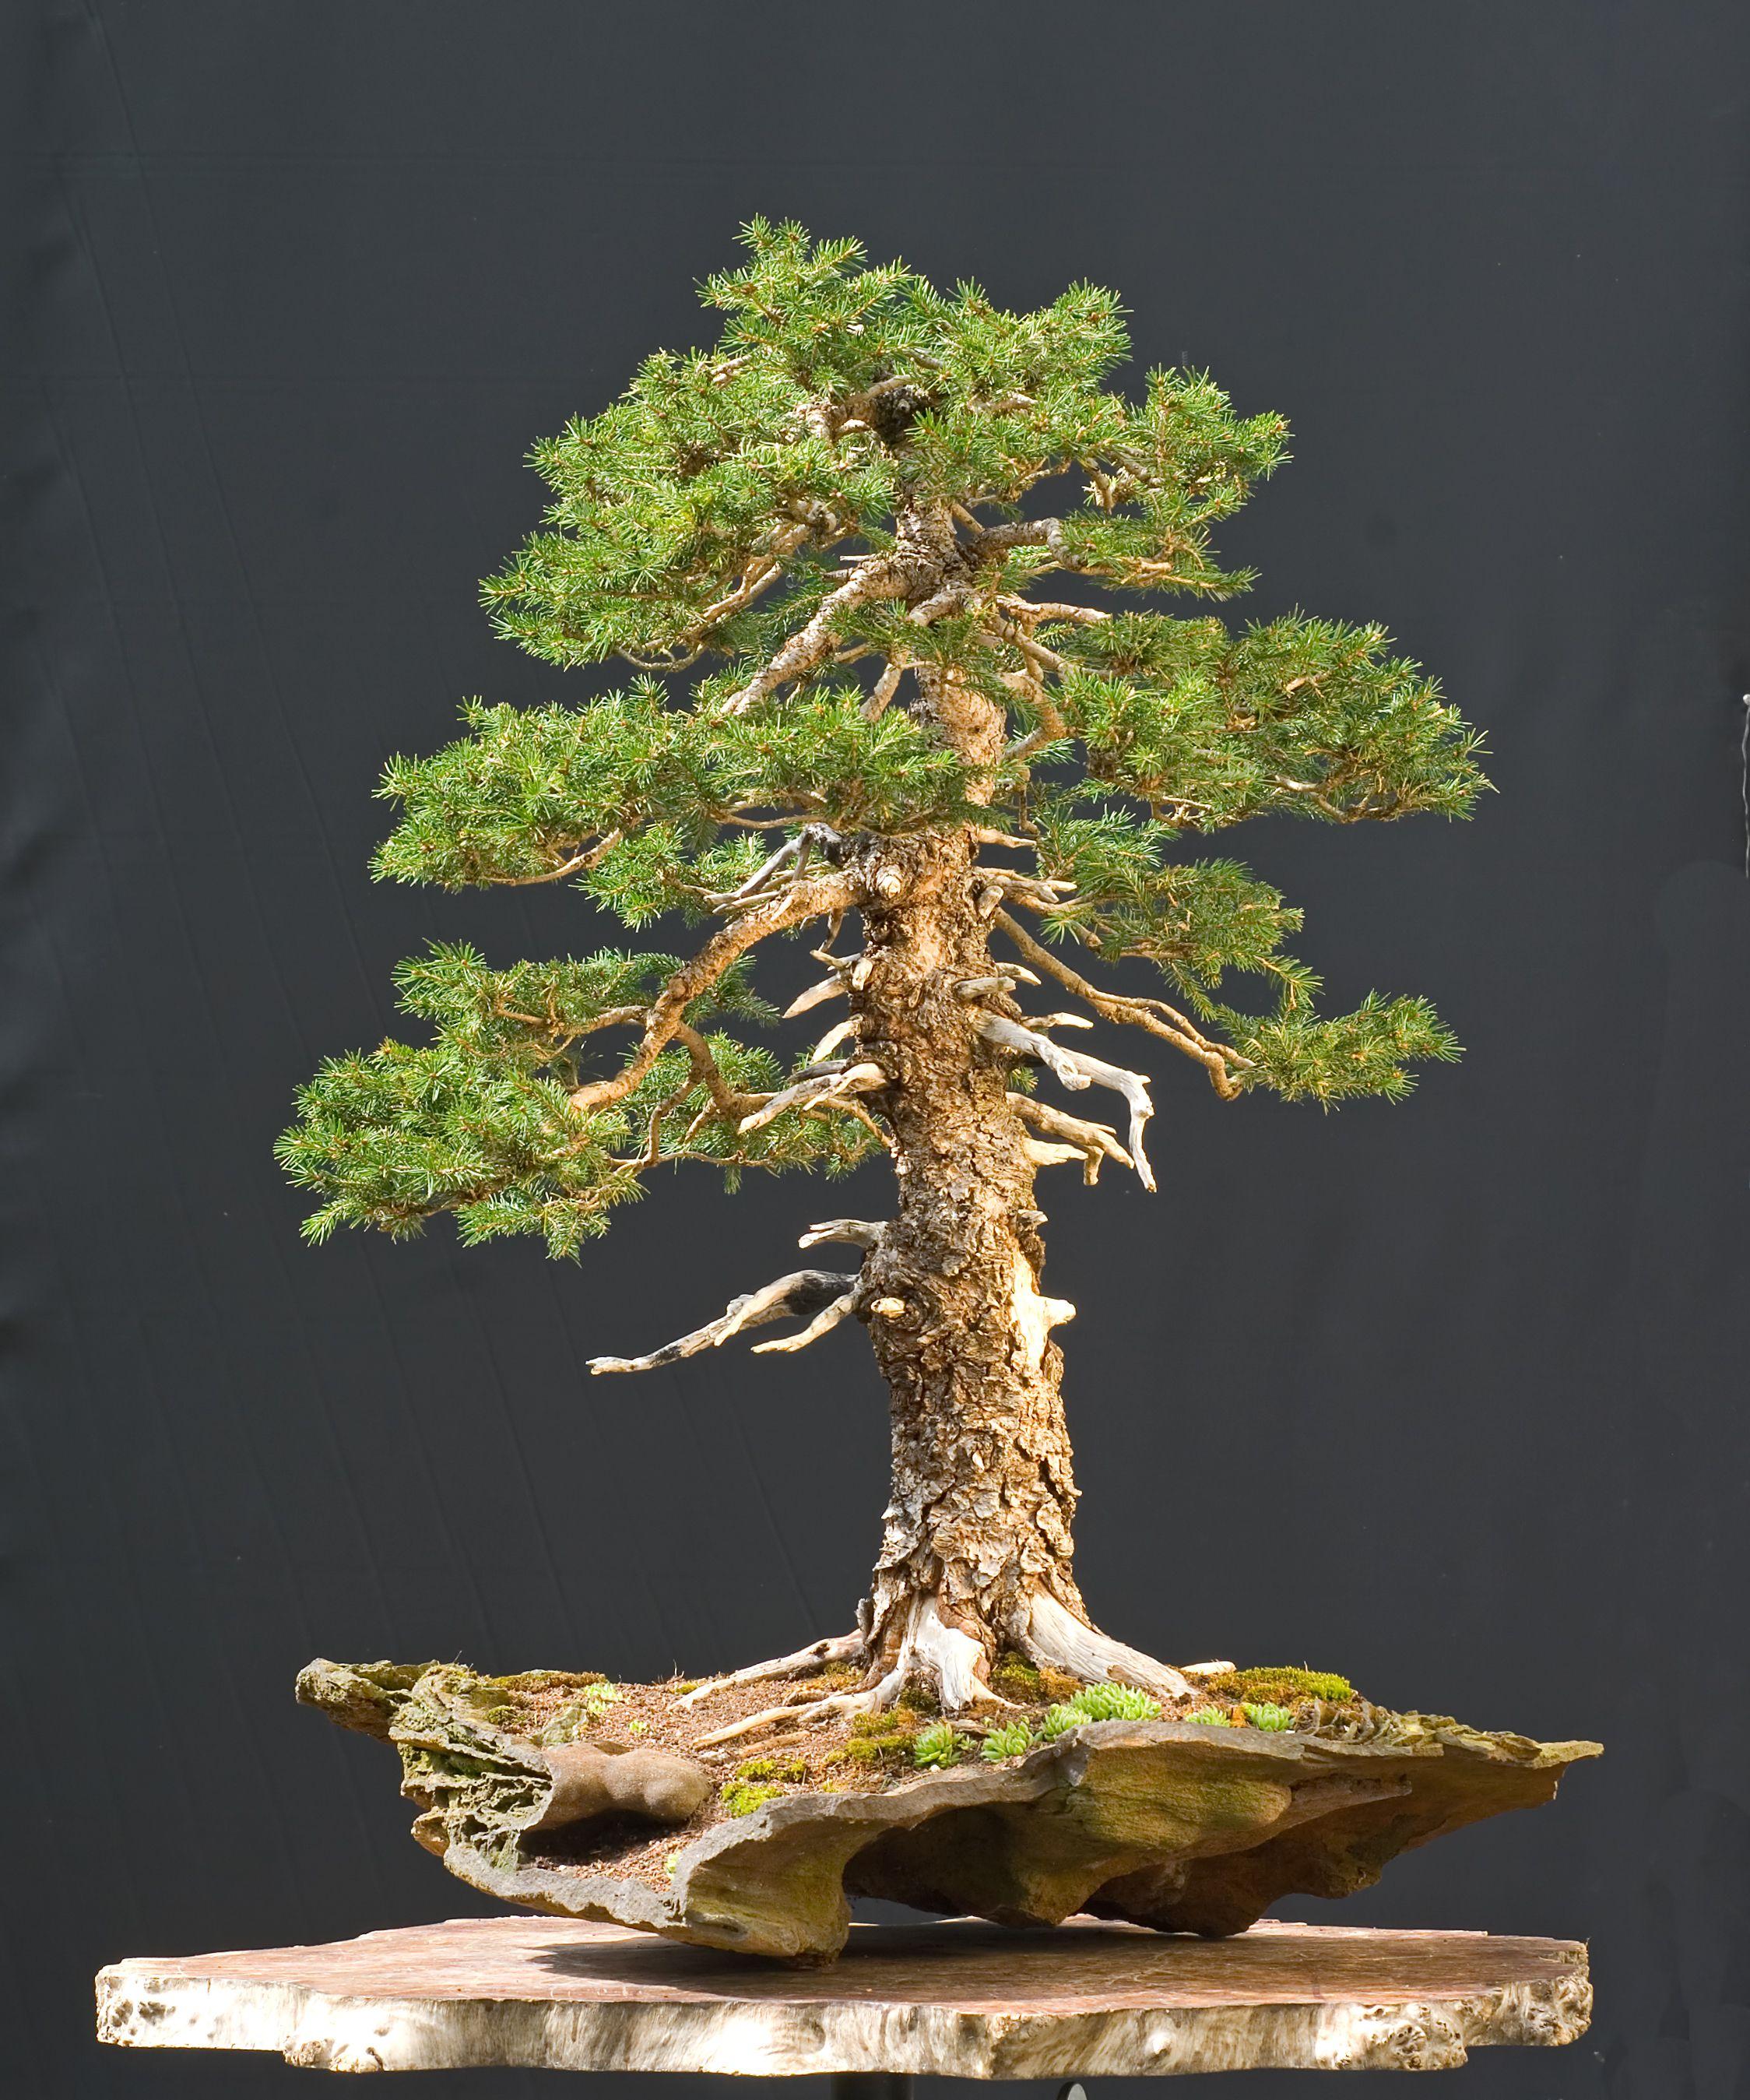 pin von ramona dee auf bonsai shohin bonsai penjing pinterest bonsai baum kleine b ume und. Black Bedroom Furniture Sets. Home Design Ideas